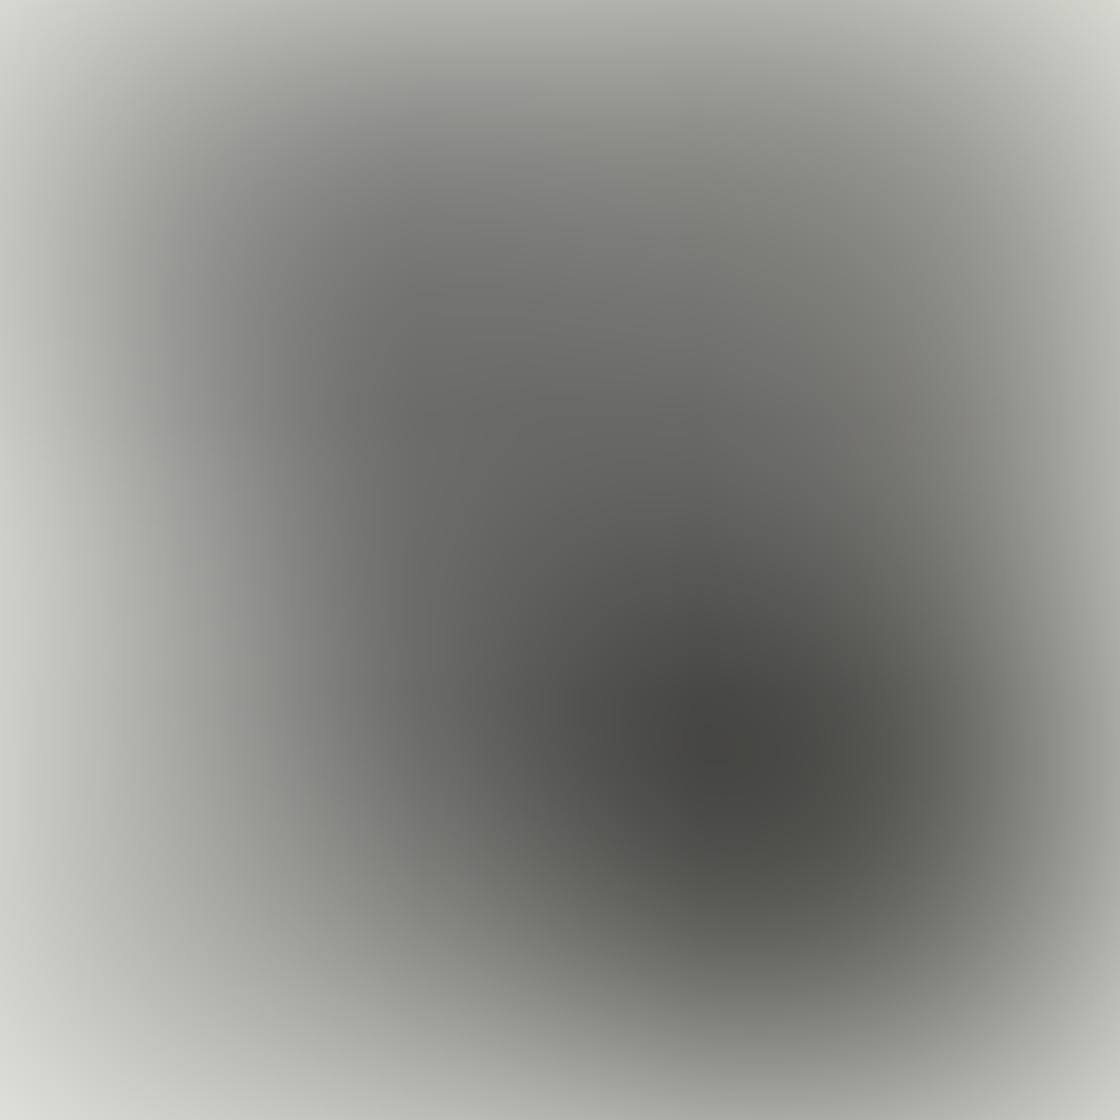 iPhone Weather Photo 28